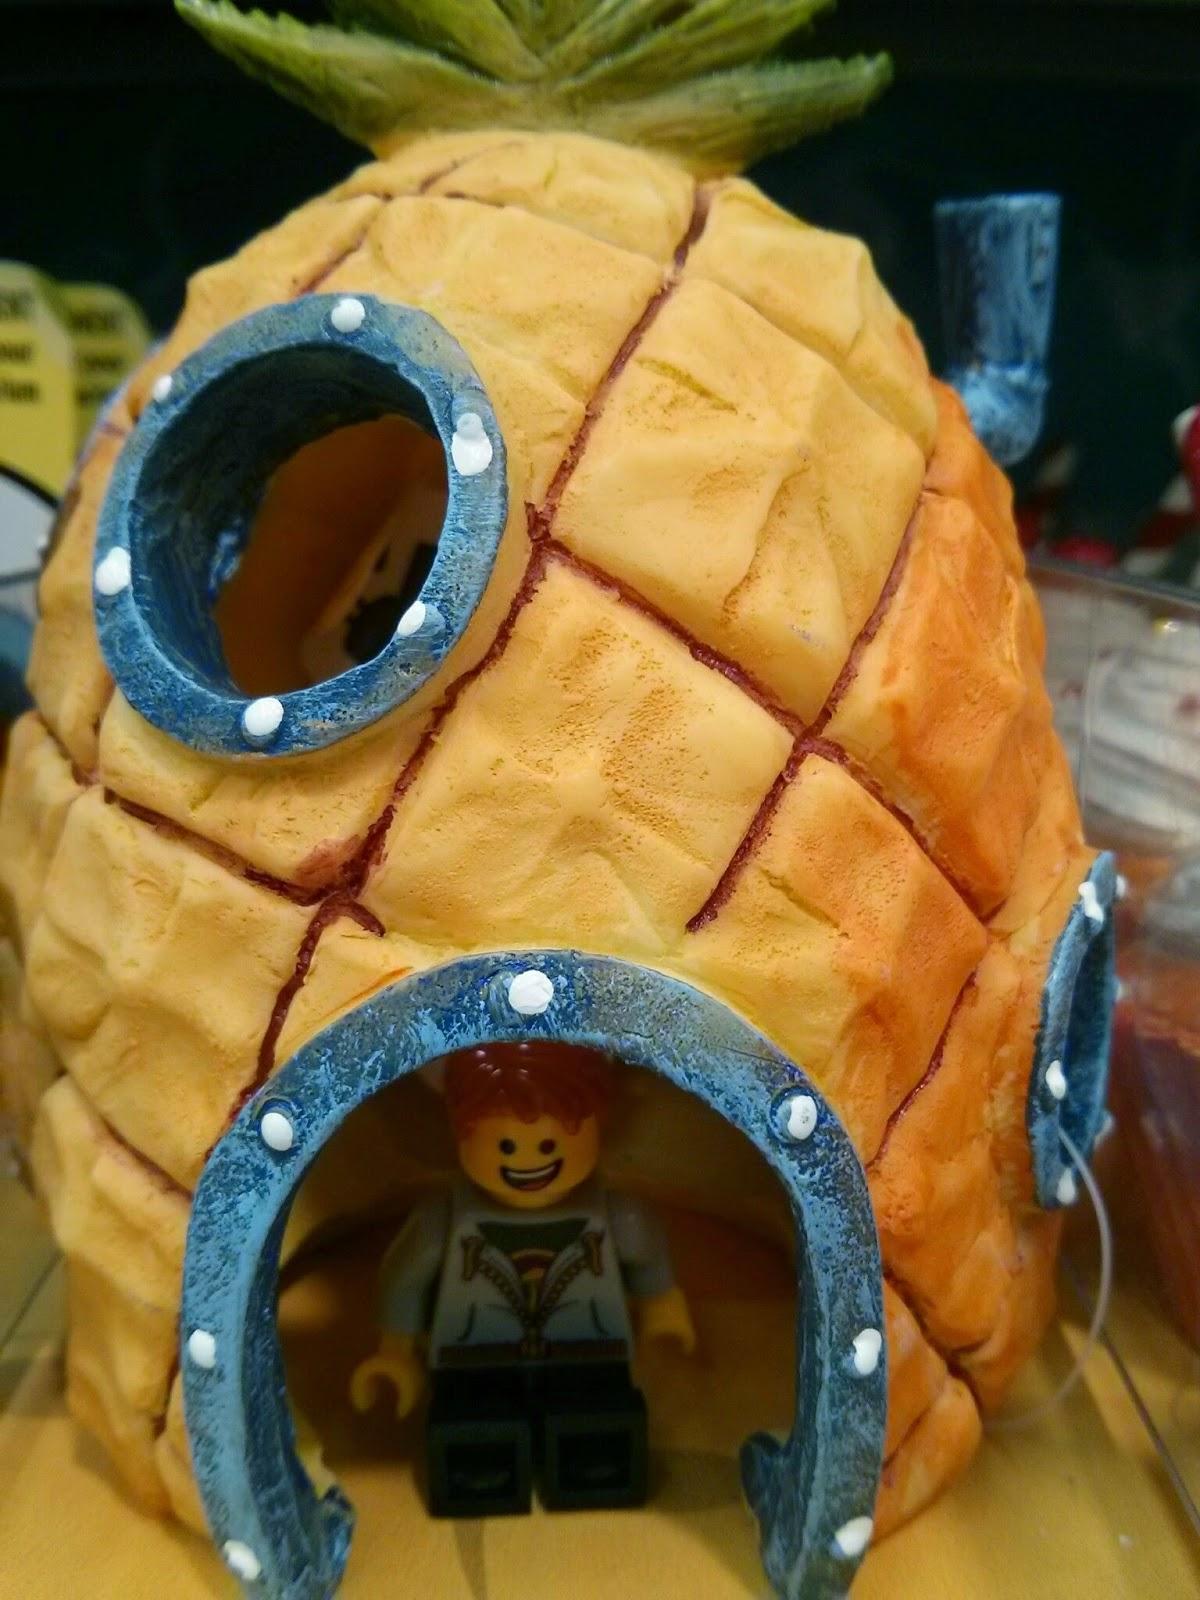 Kyle Emmett Sponge Bob Square Pants Pineapple House